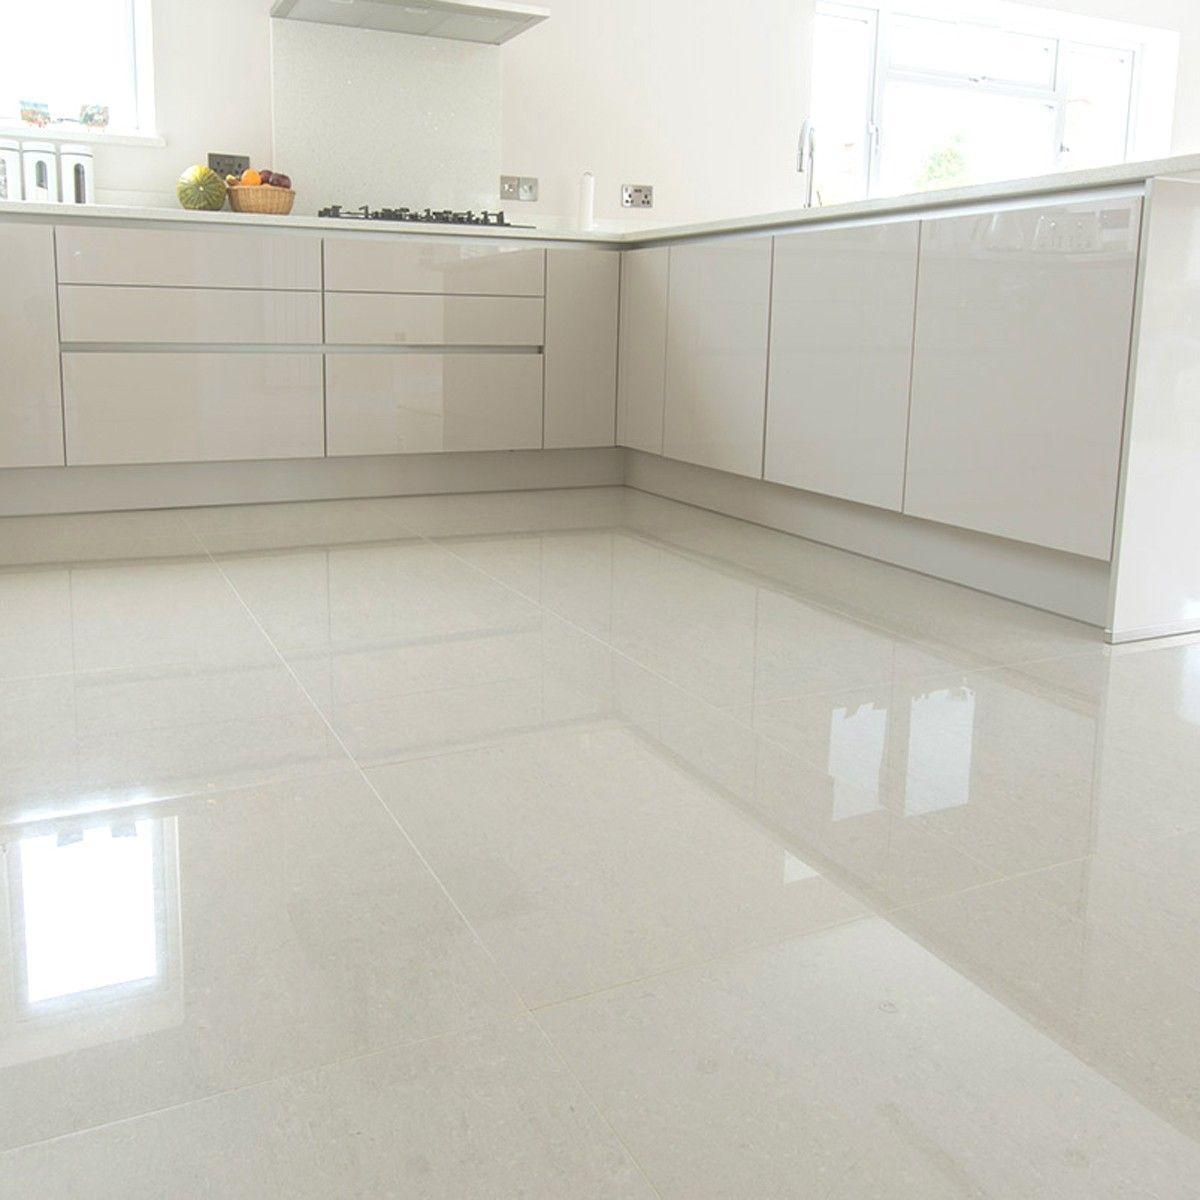 37+ Fine Ceramic Floors Tile Photo